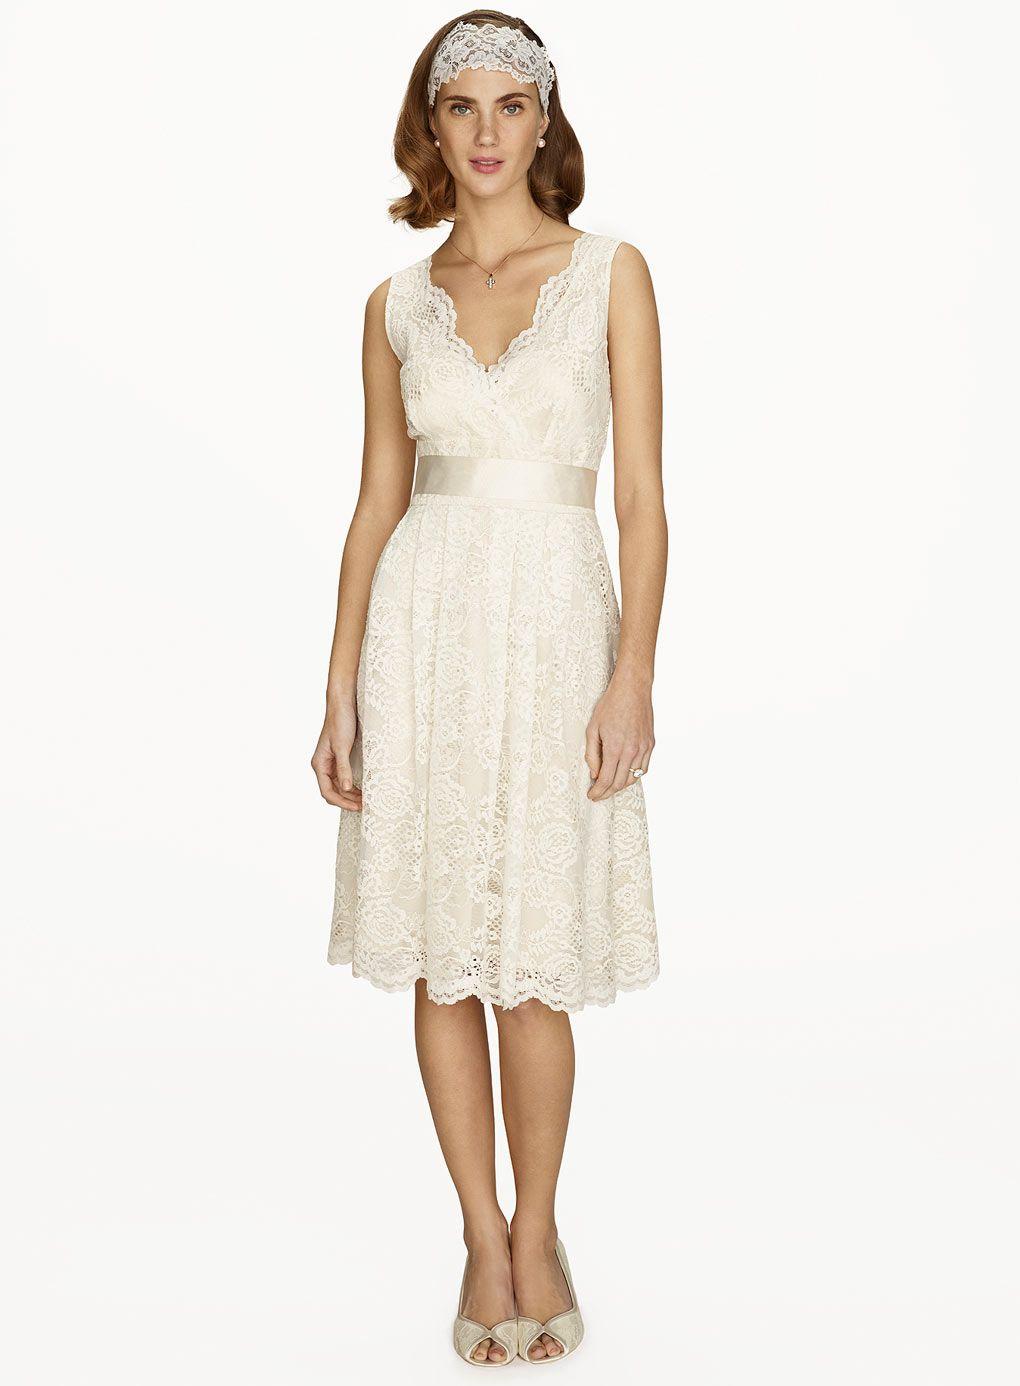 Sofia short bridal dress httpweddingheartbhs wedding sofia short bridal dress httpweddingheart ombrellifo Choice Image